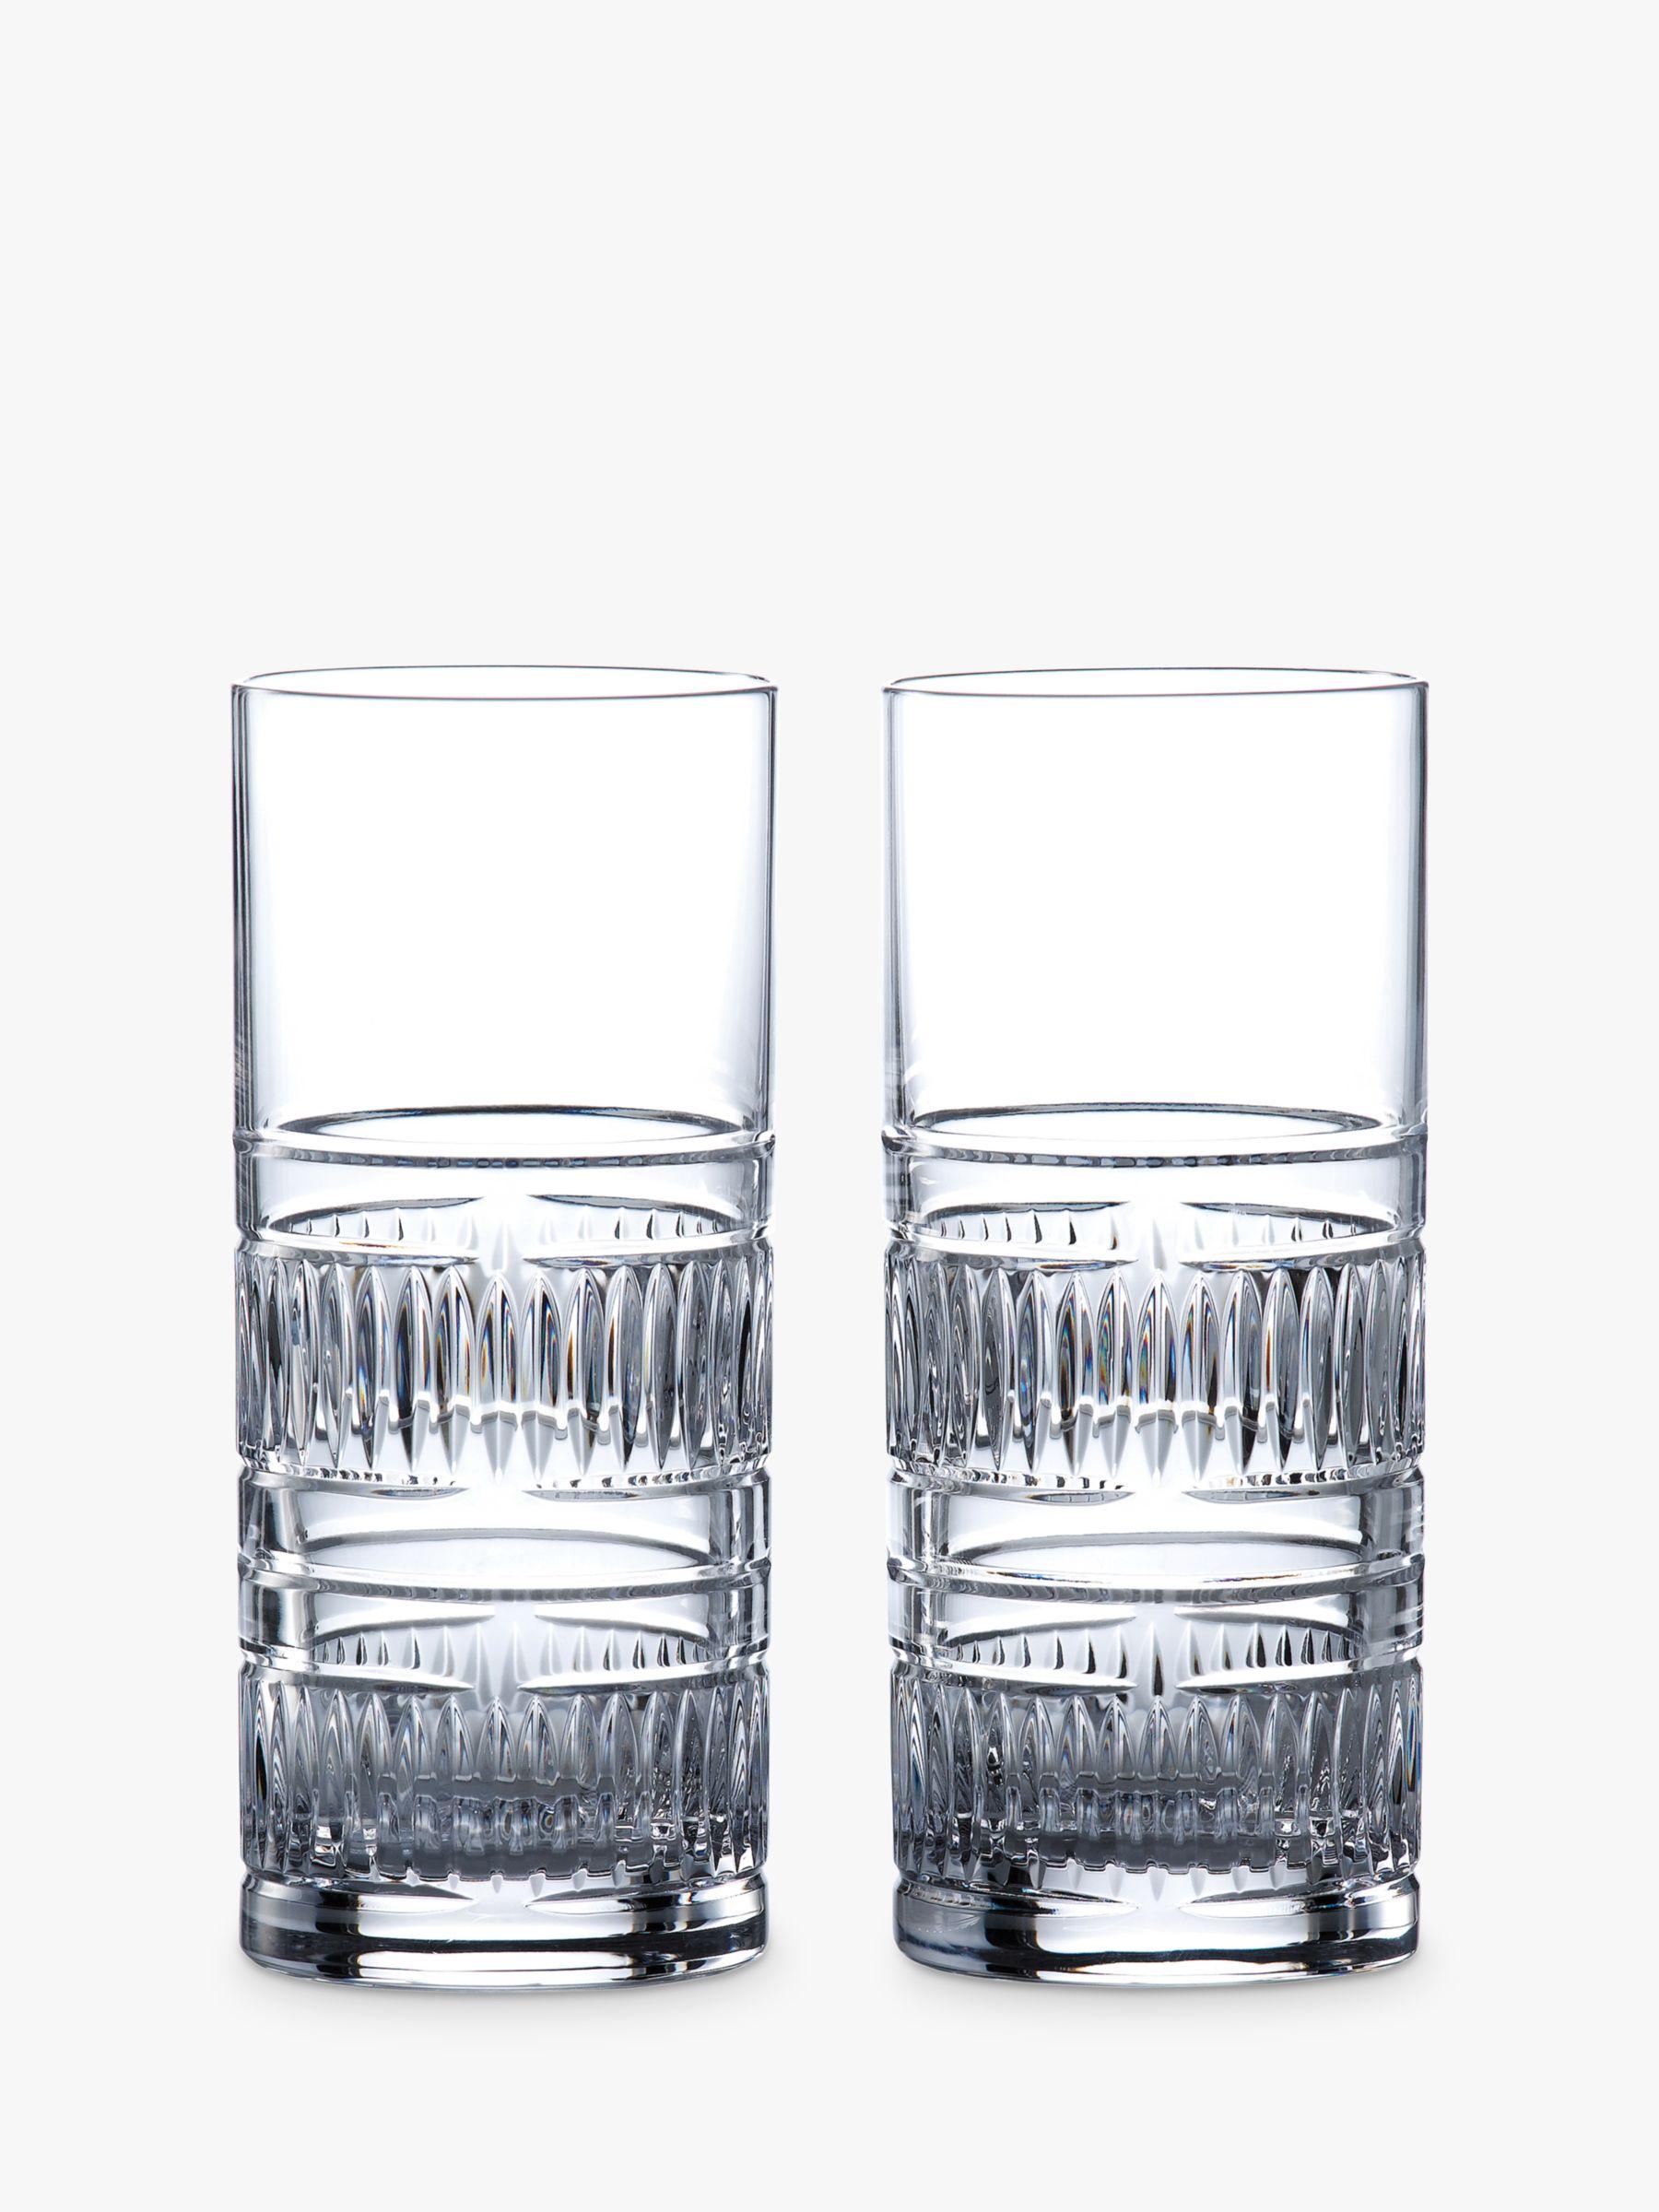 Royal Doulton Royal Doulton R&D Collection Radial Crystal Cut Glass Highballs, 320ml, Set of 2